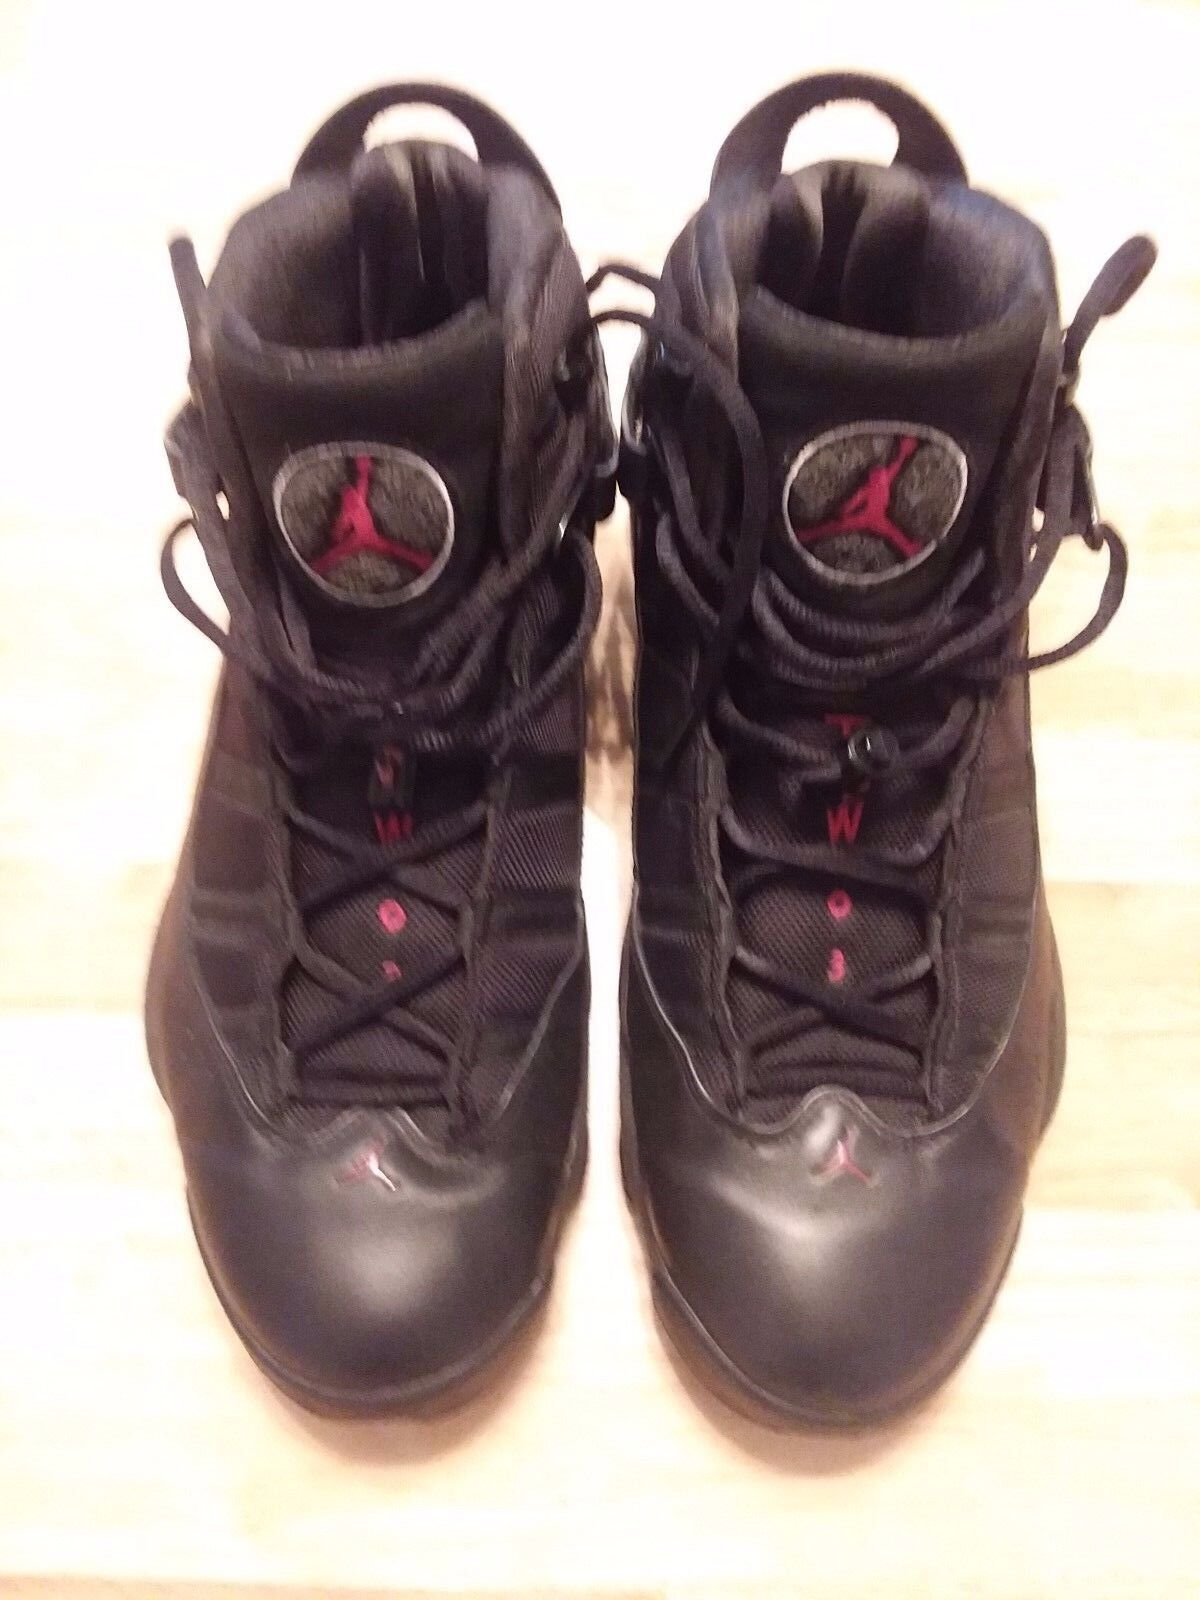 Nike Air Jordan mens basketball shoes size 13 13 size mint condition 77e47d